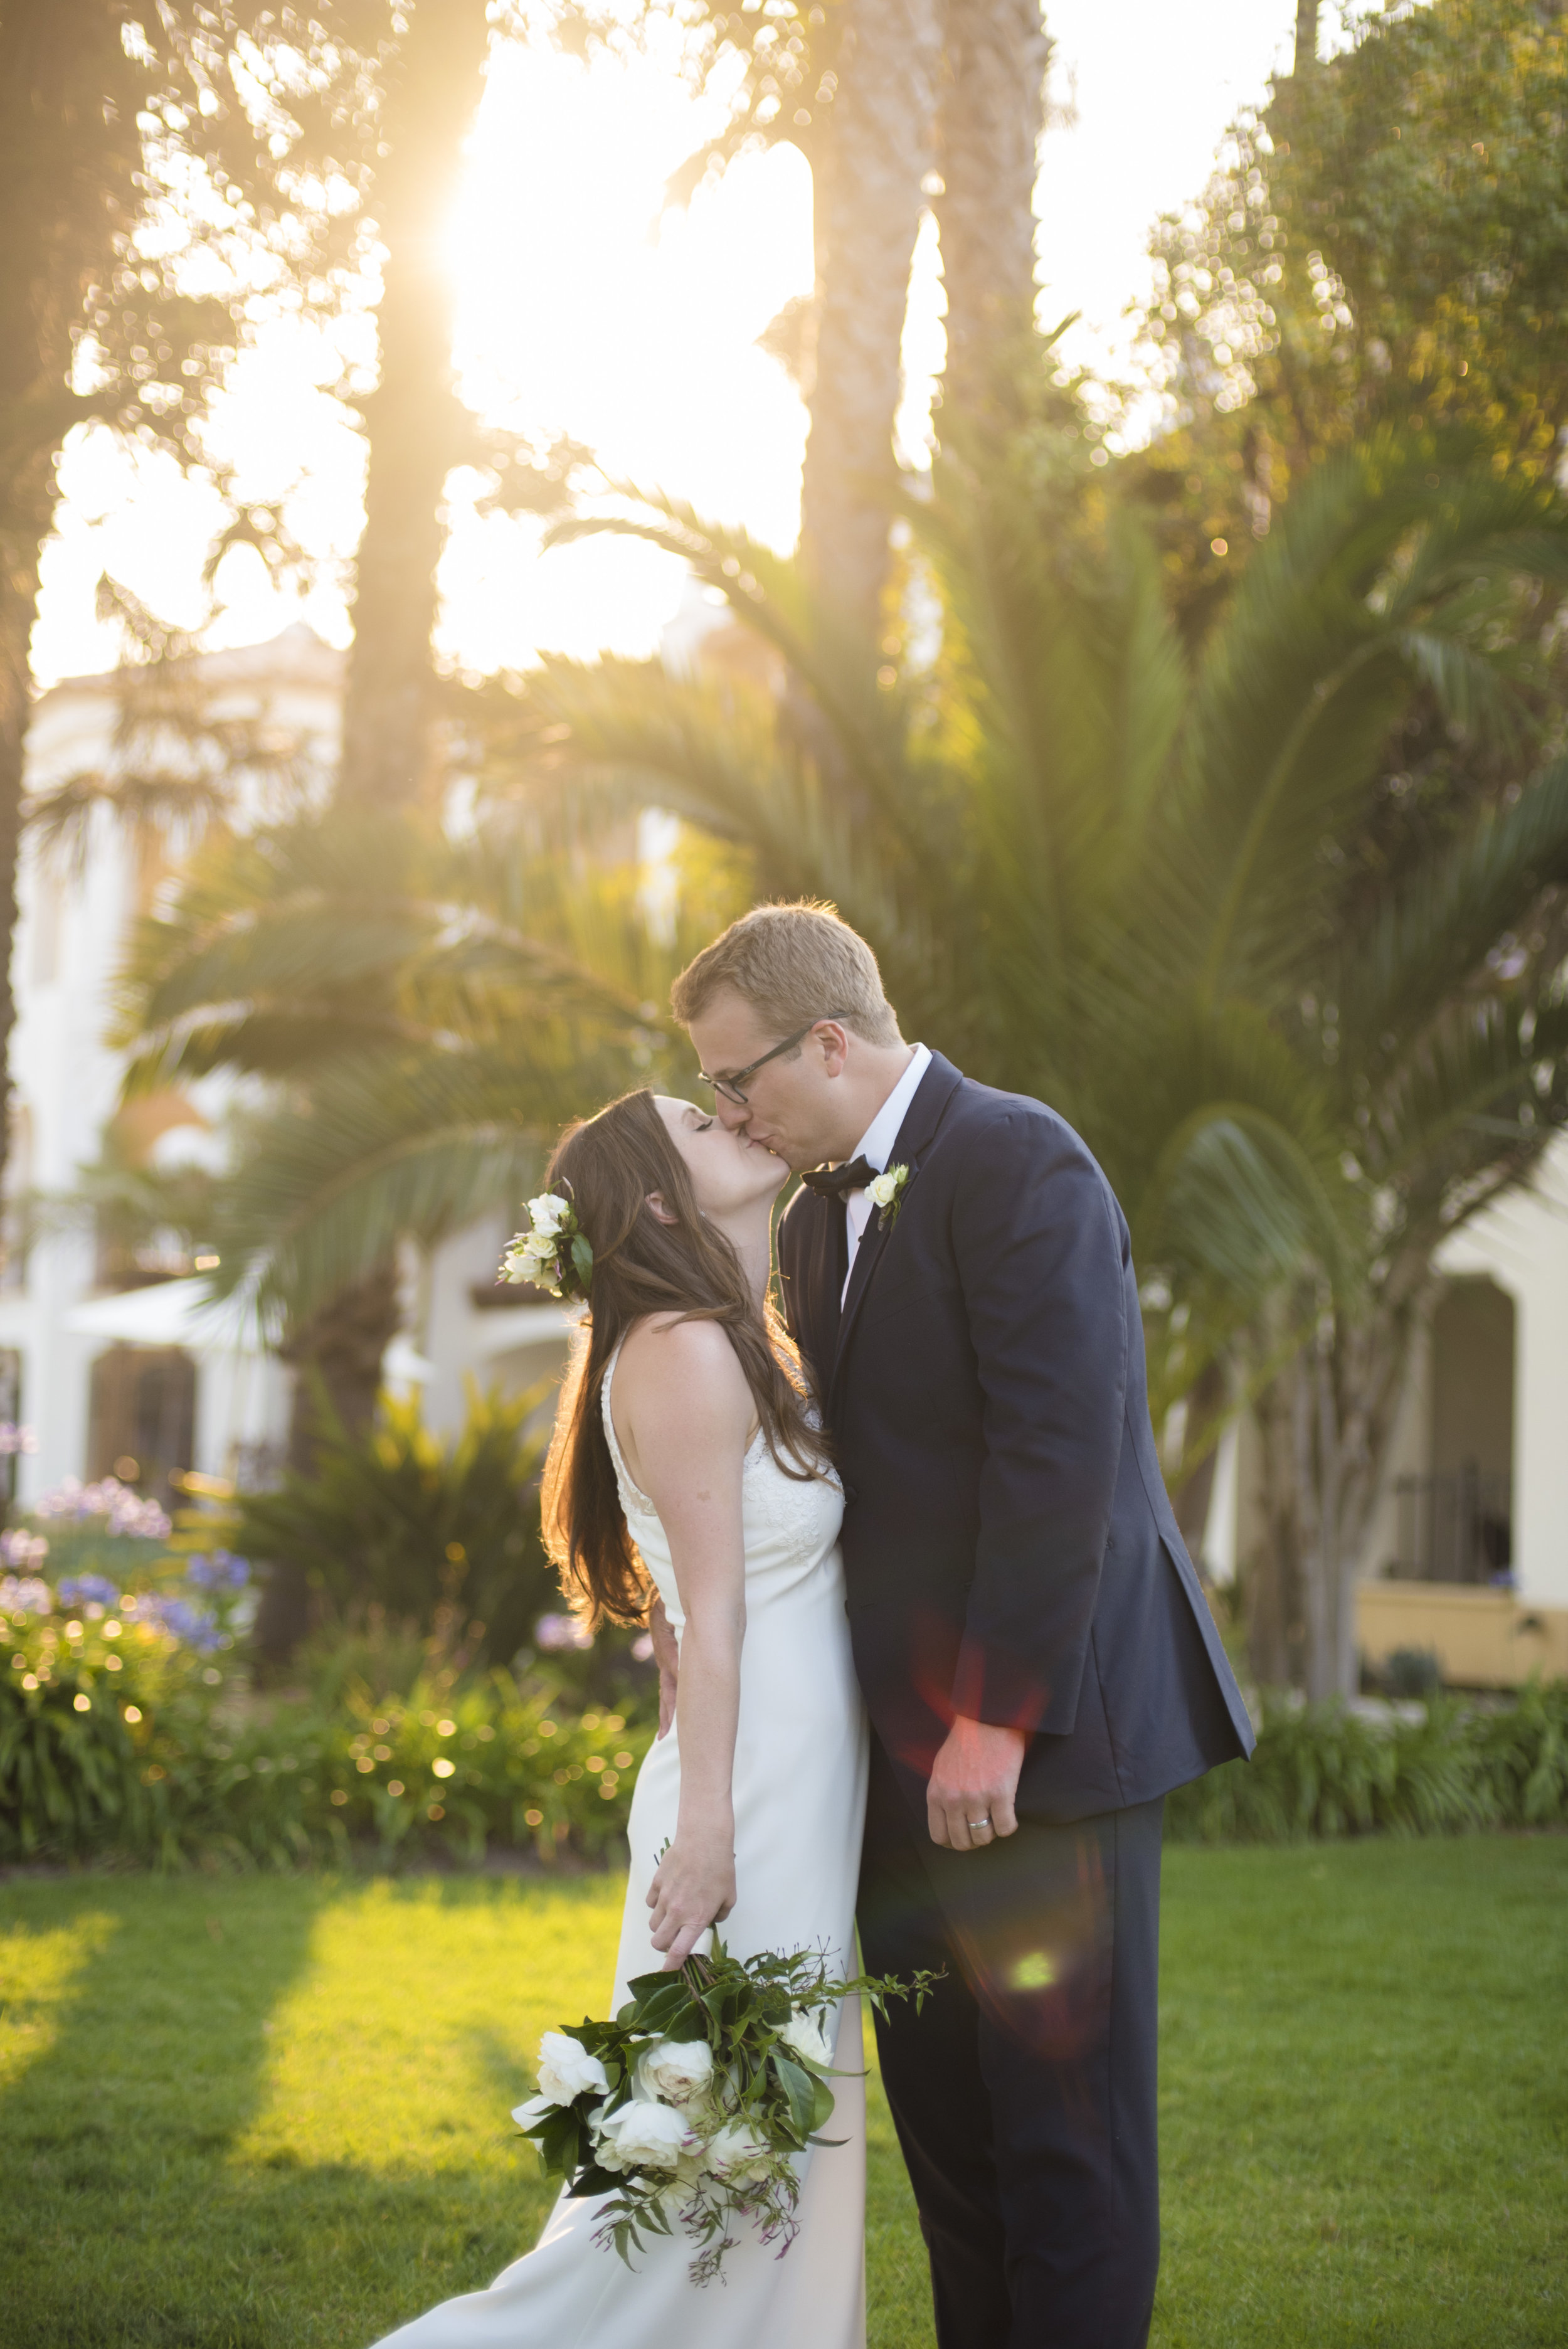 www.santabarbarawedding.com | ByCherry Photography | Felici Events | Convivo Restaurant | Bride and Groom